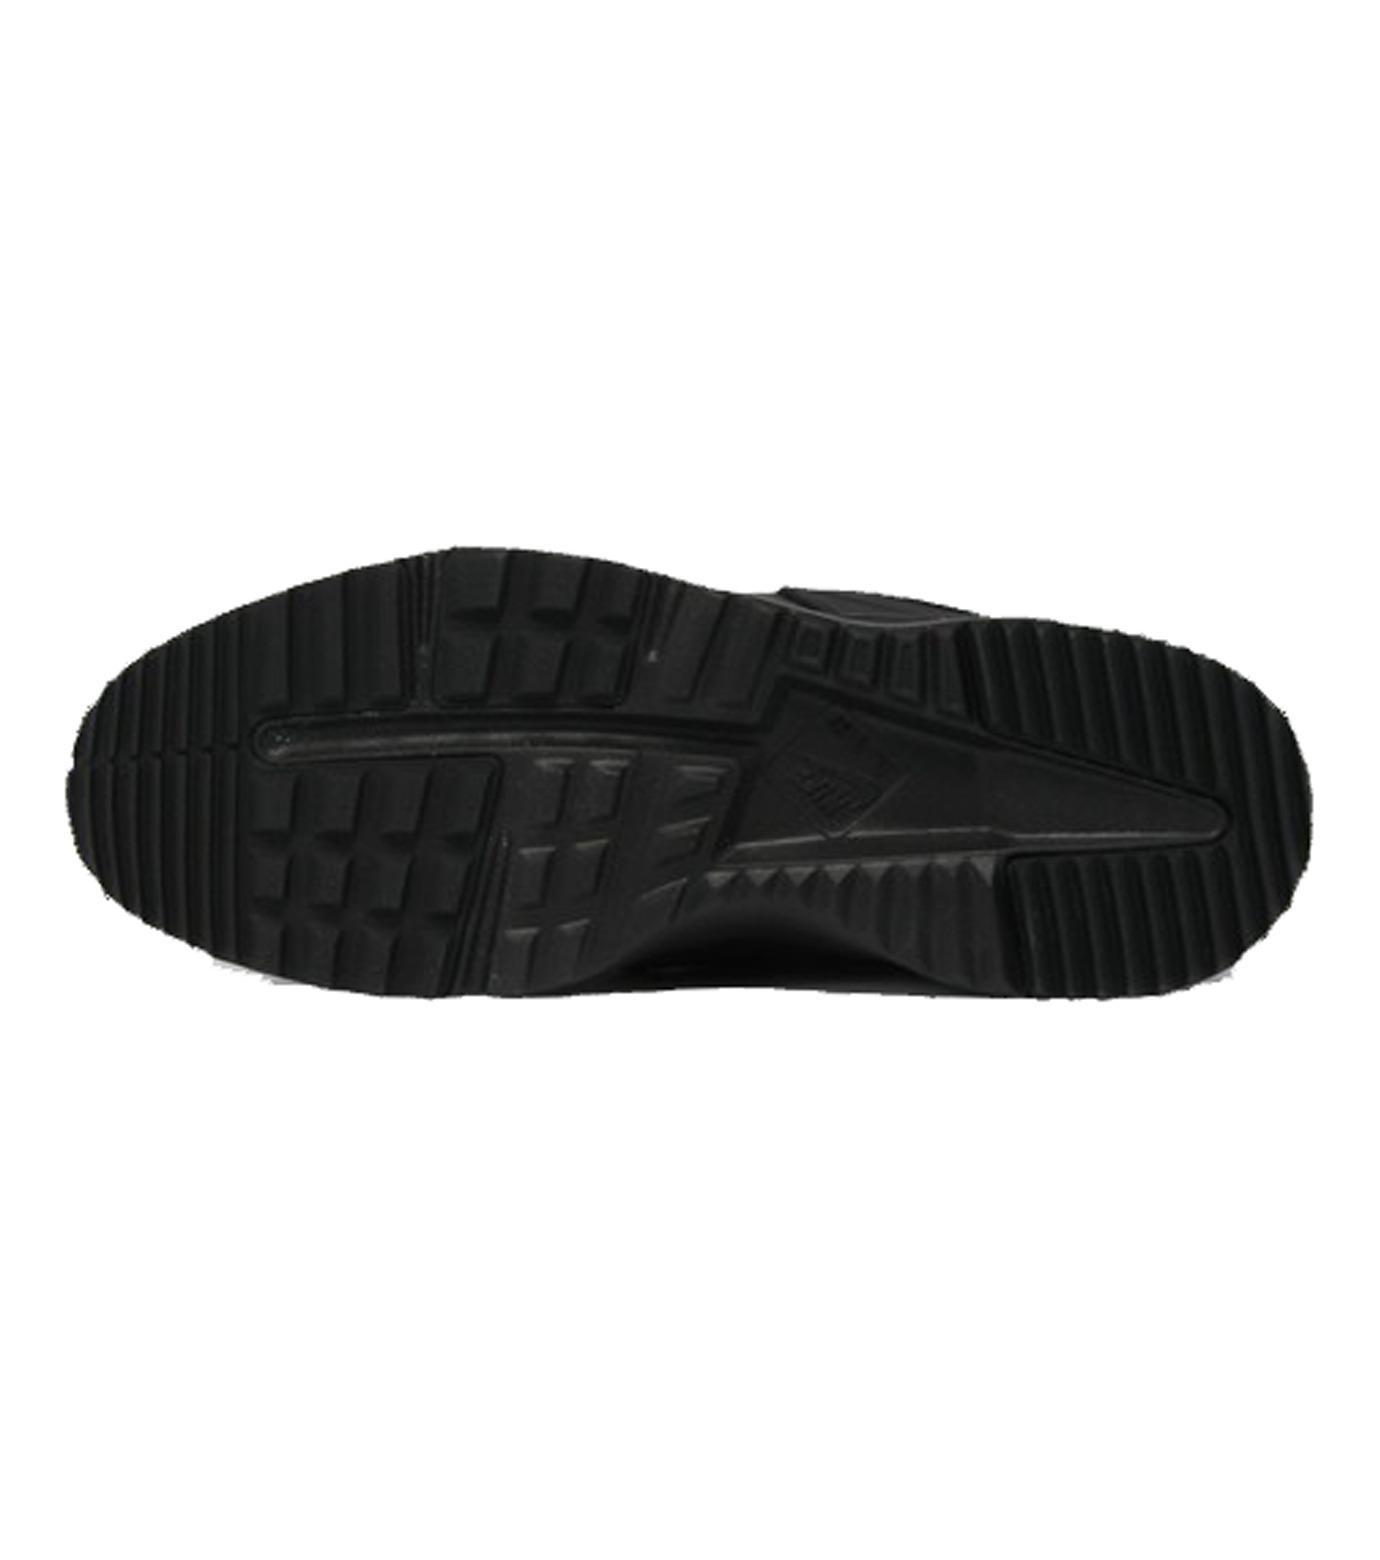 NIKE(ナイキ)のAIR HUARACHE 2/3-BLACK(シューズ/shoes)-806807-002-13 拡大詳細画像2